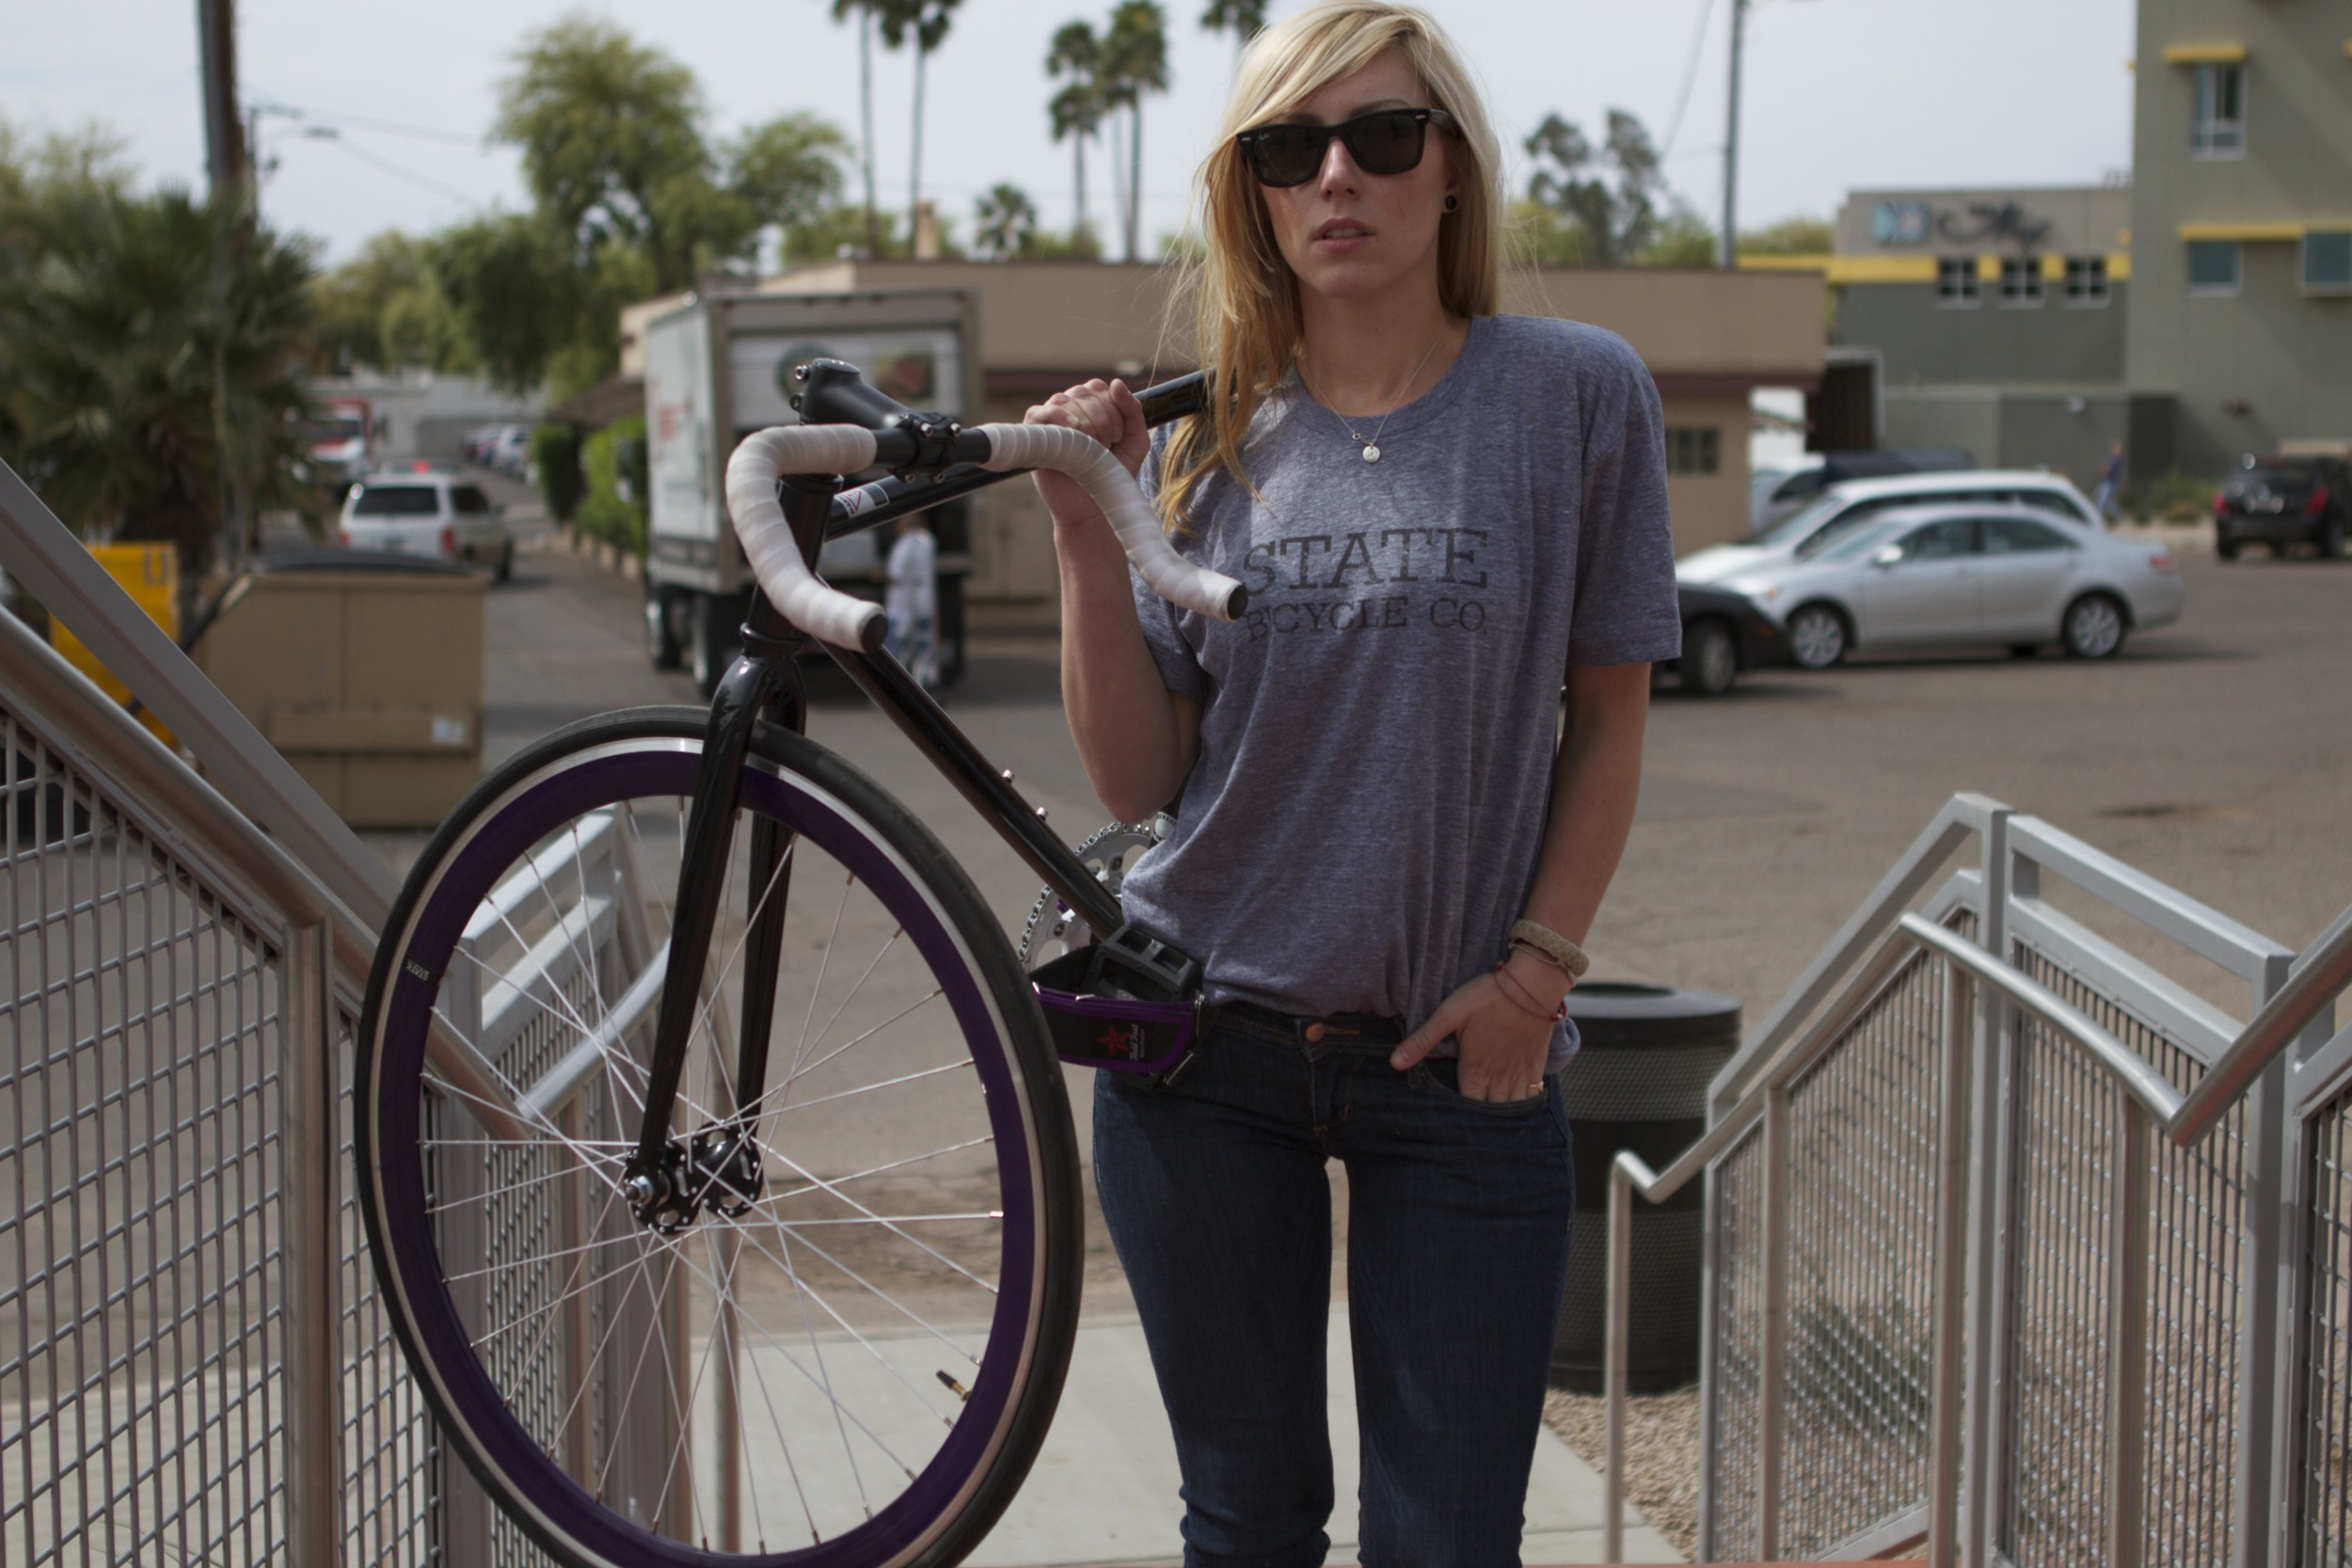 Phantom-by-State-Bicycle-Co.-.jpg